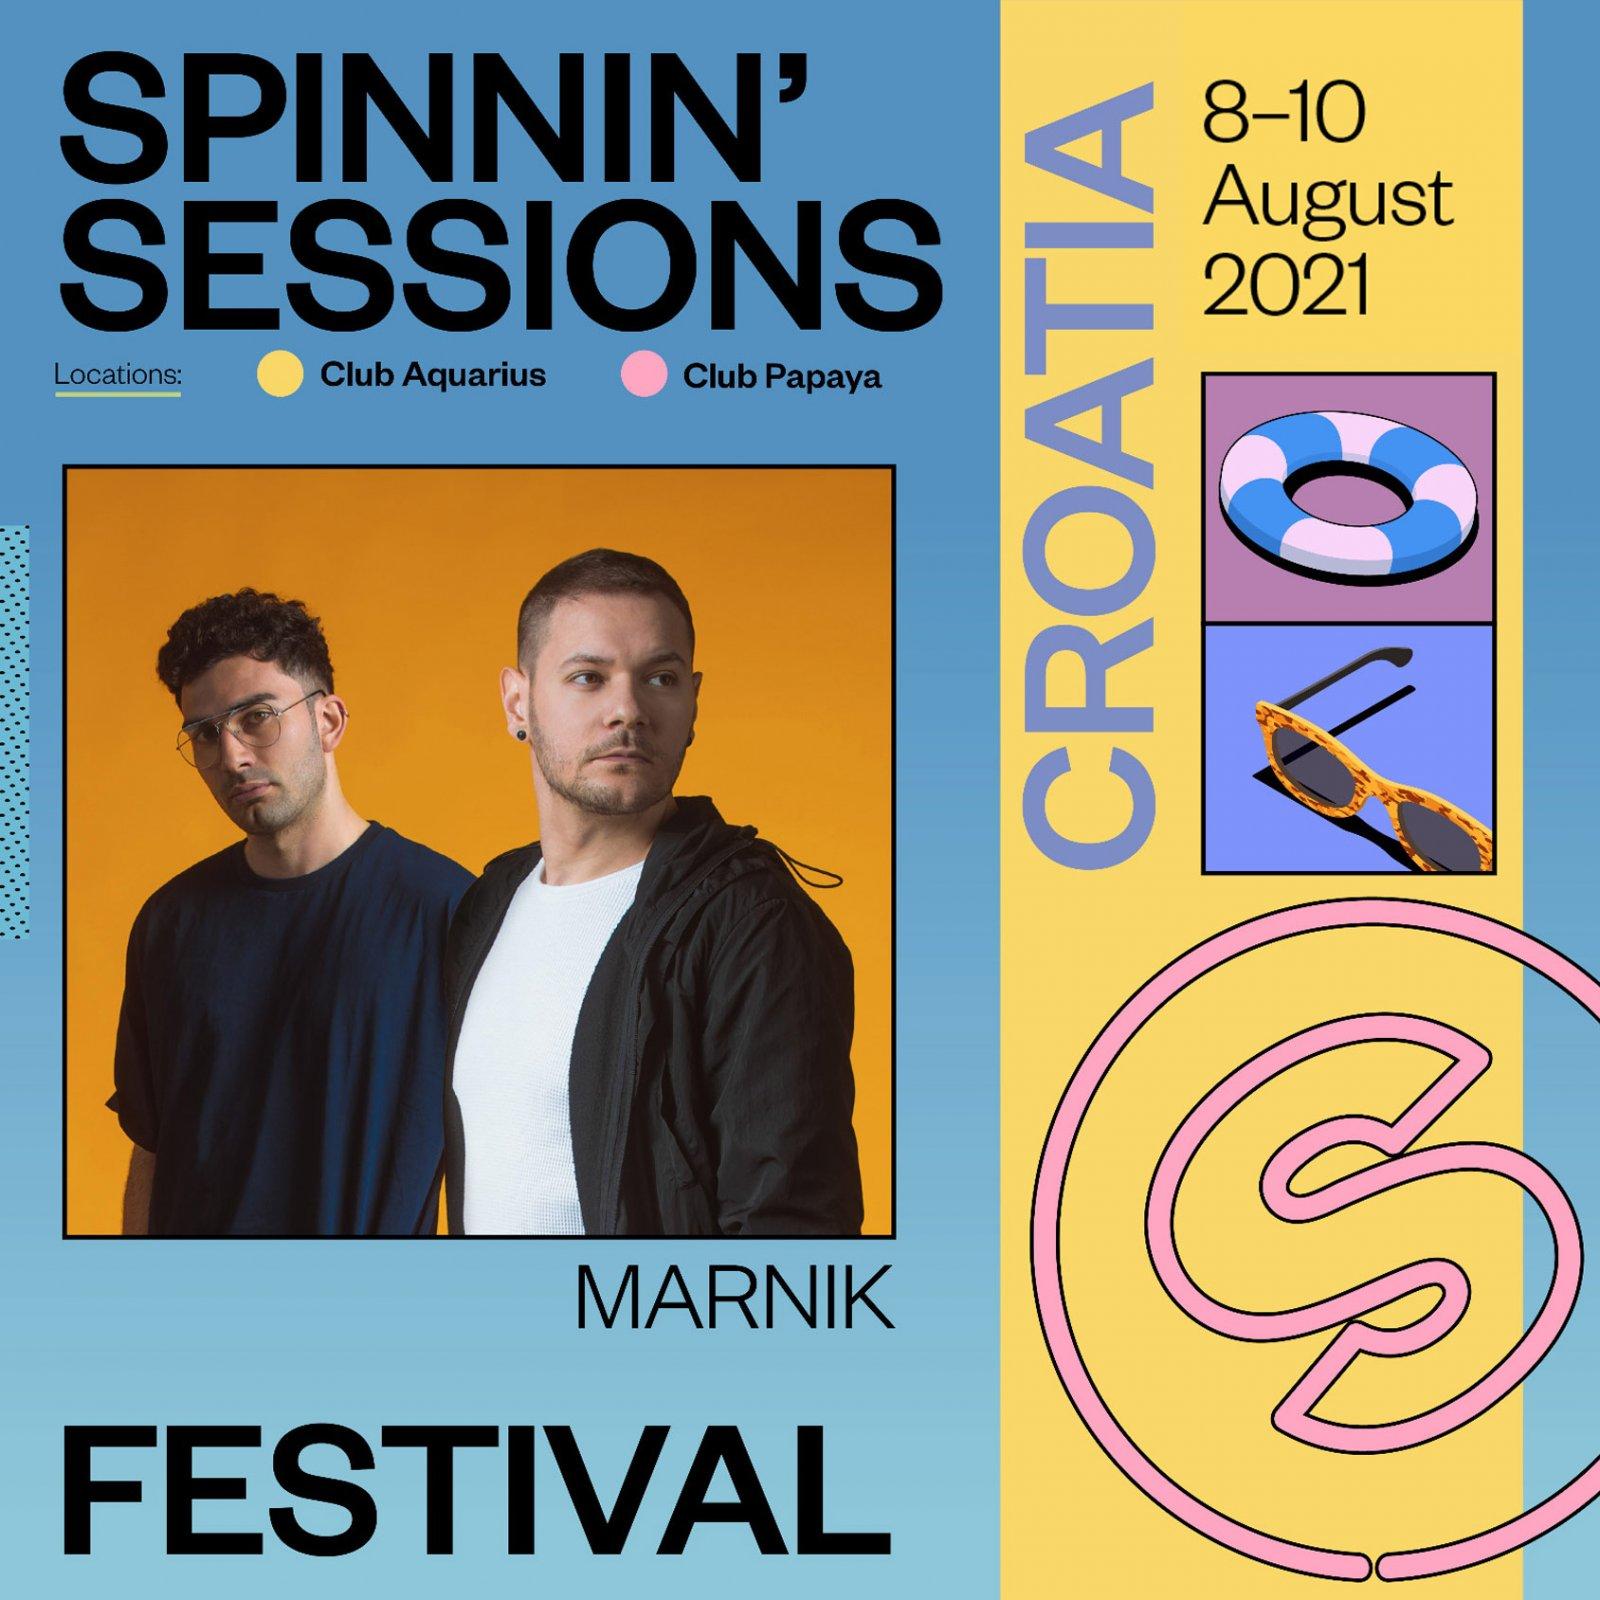 Spinnin' Sessions Festival 2021 Croatia Marnik